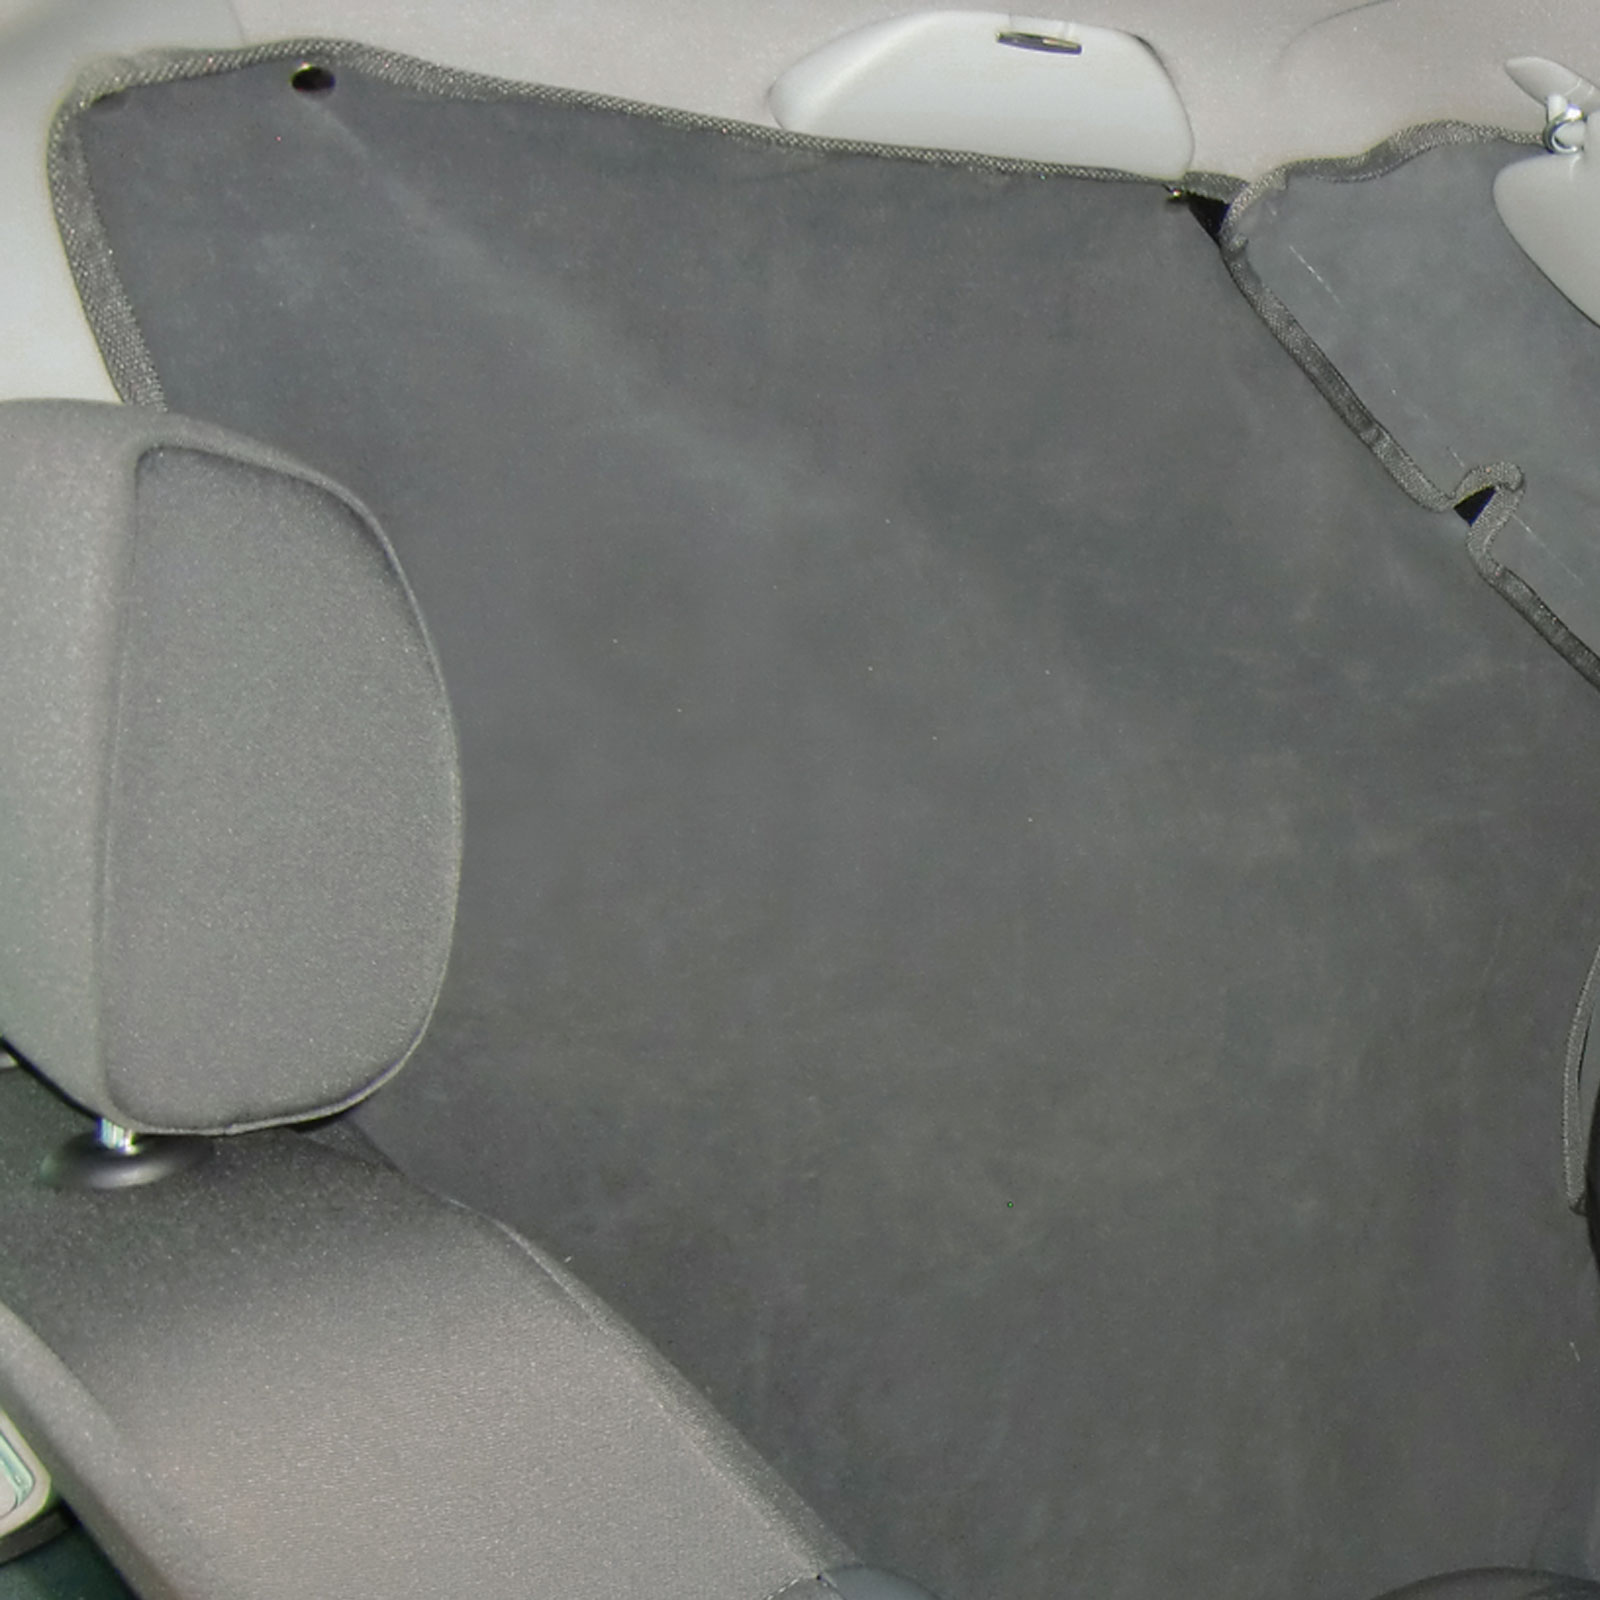 isoflex thermomatten f r fahrerhaus sonnenschutz f r vw. Black Bedroom Furniture Sets. Home Design Ideas